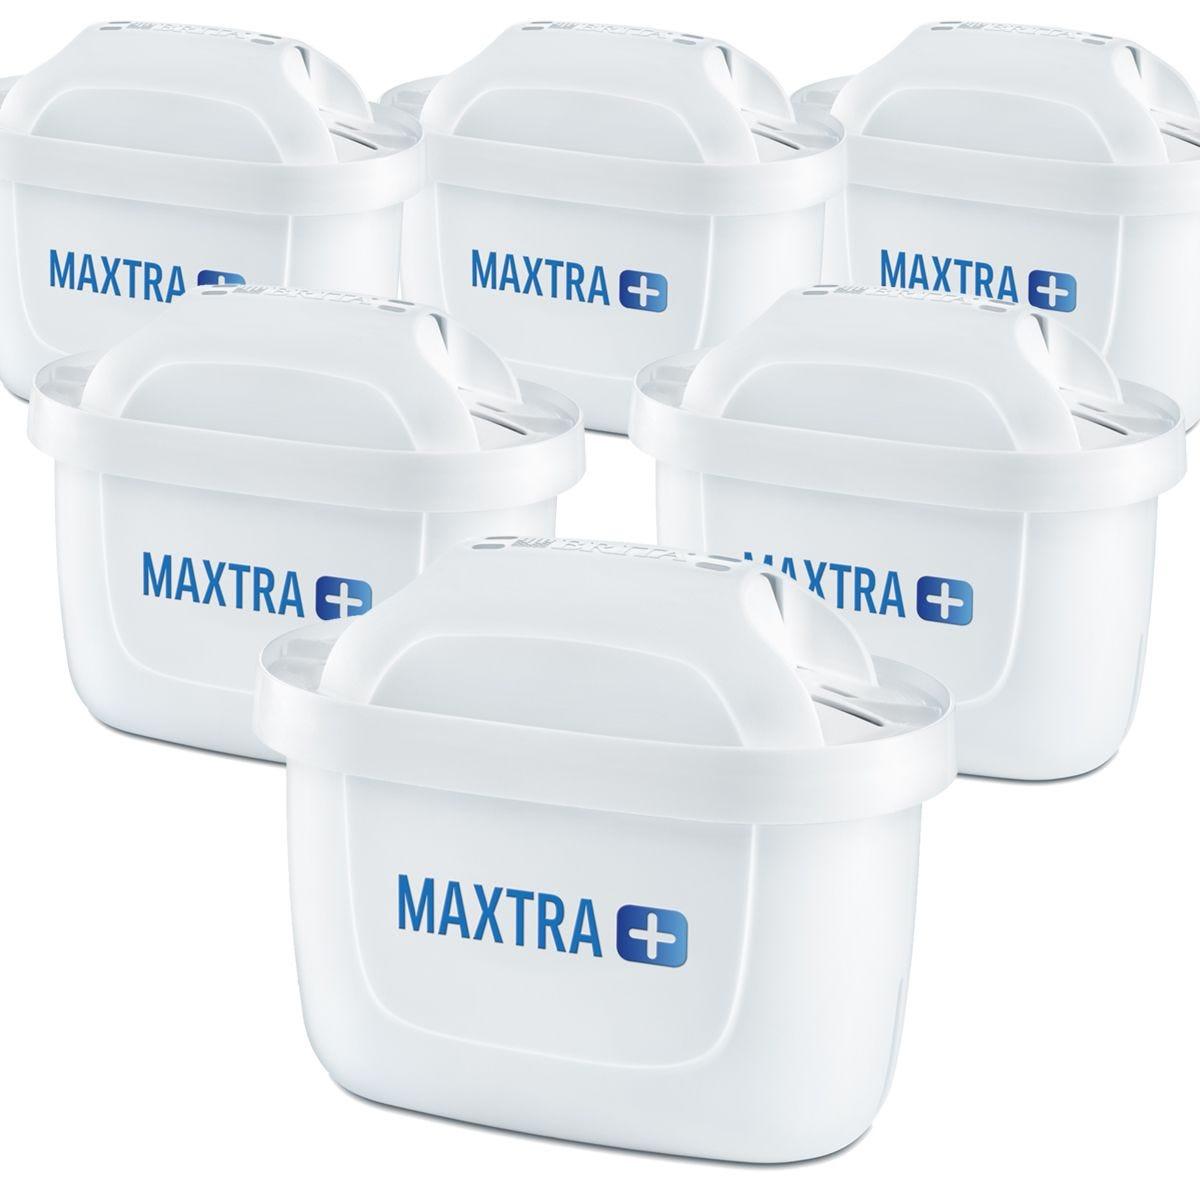 Brita Maxtra+ Water Filter Cartridges - 6 Pack